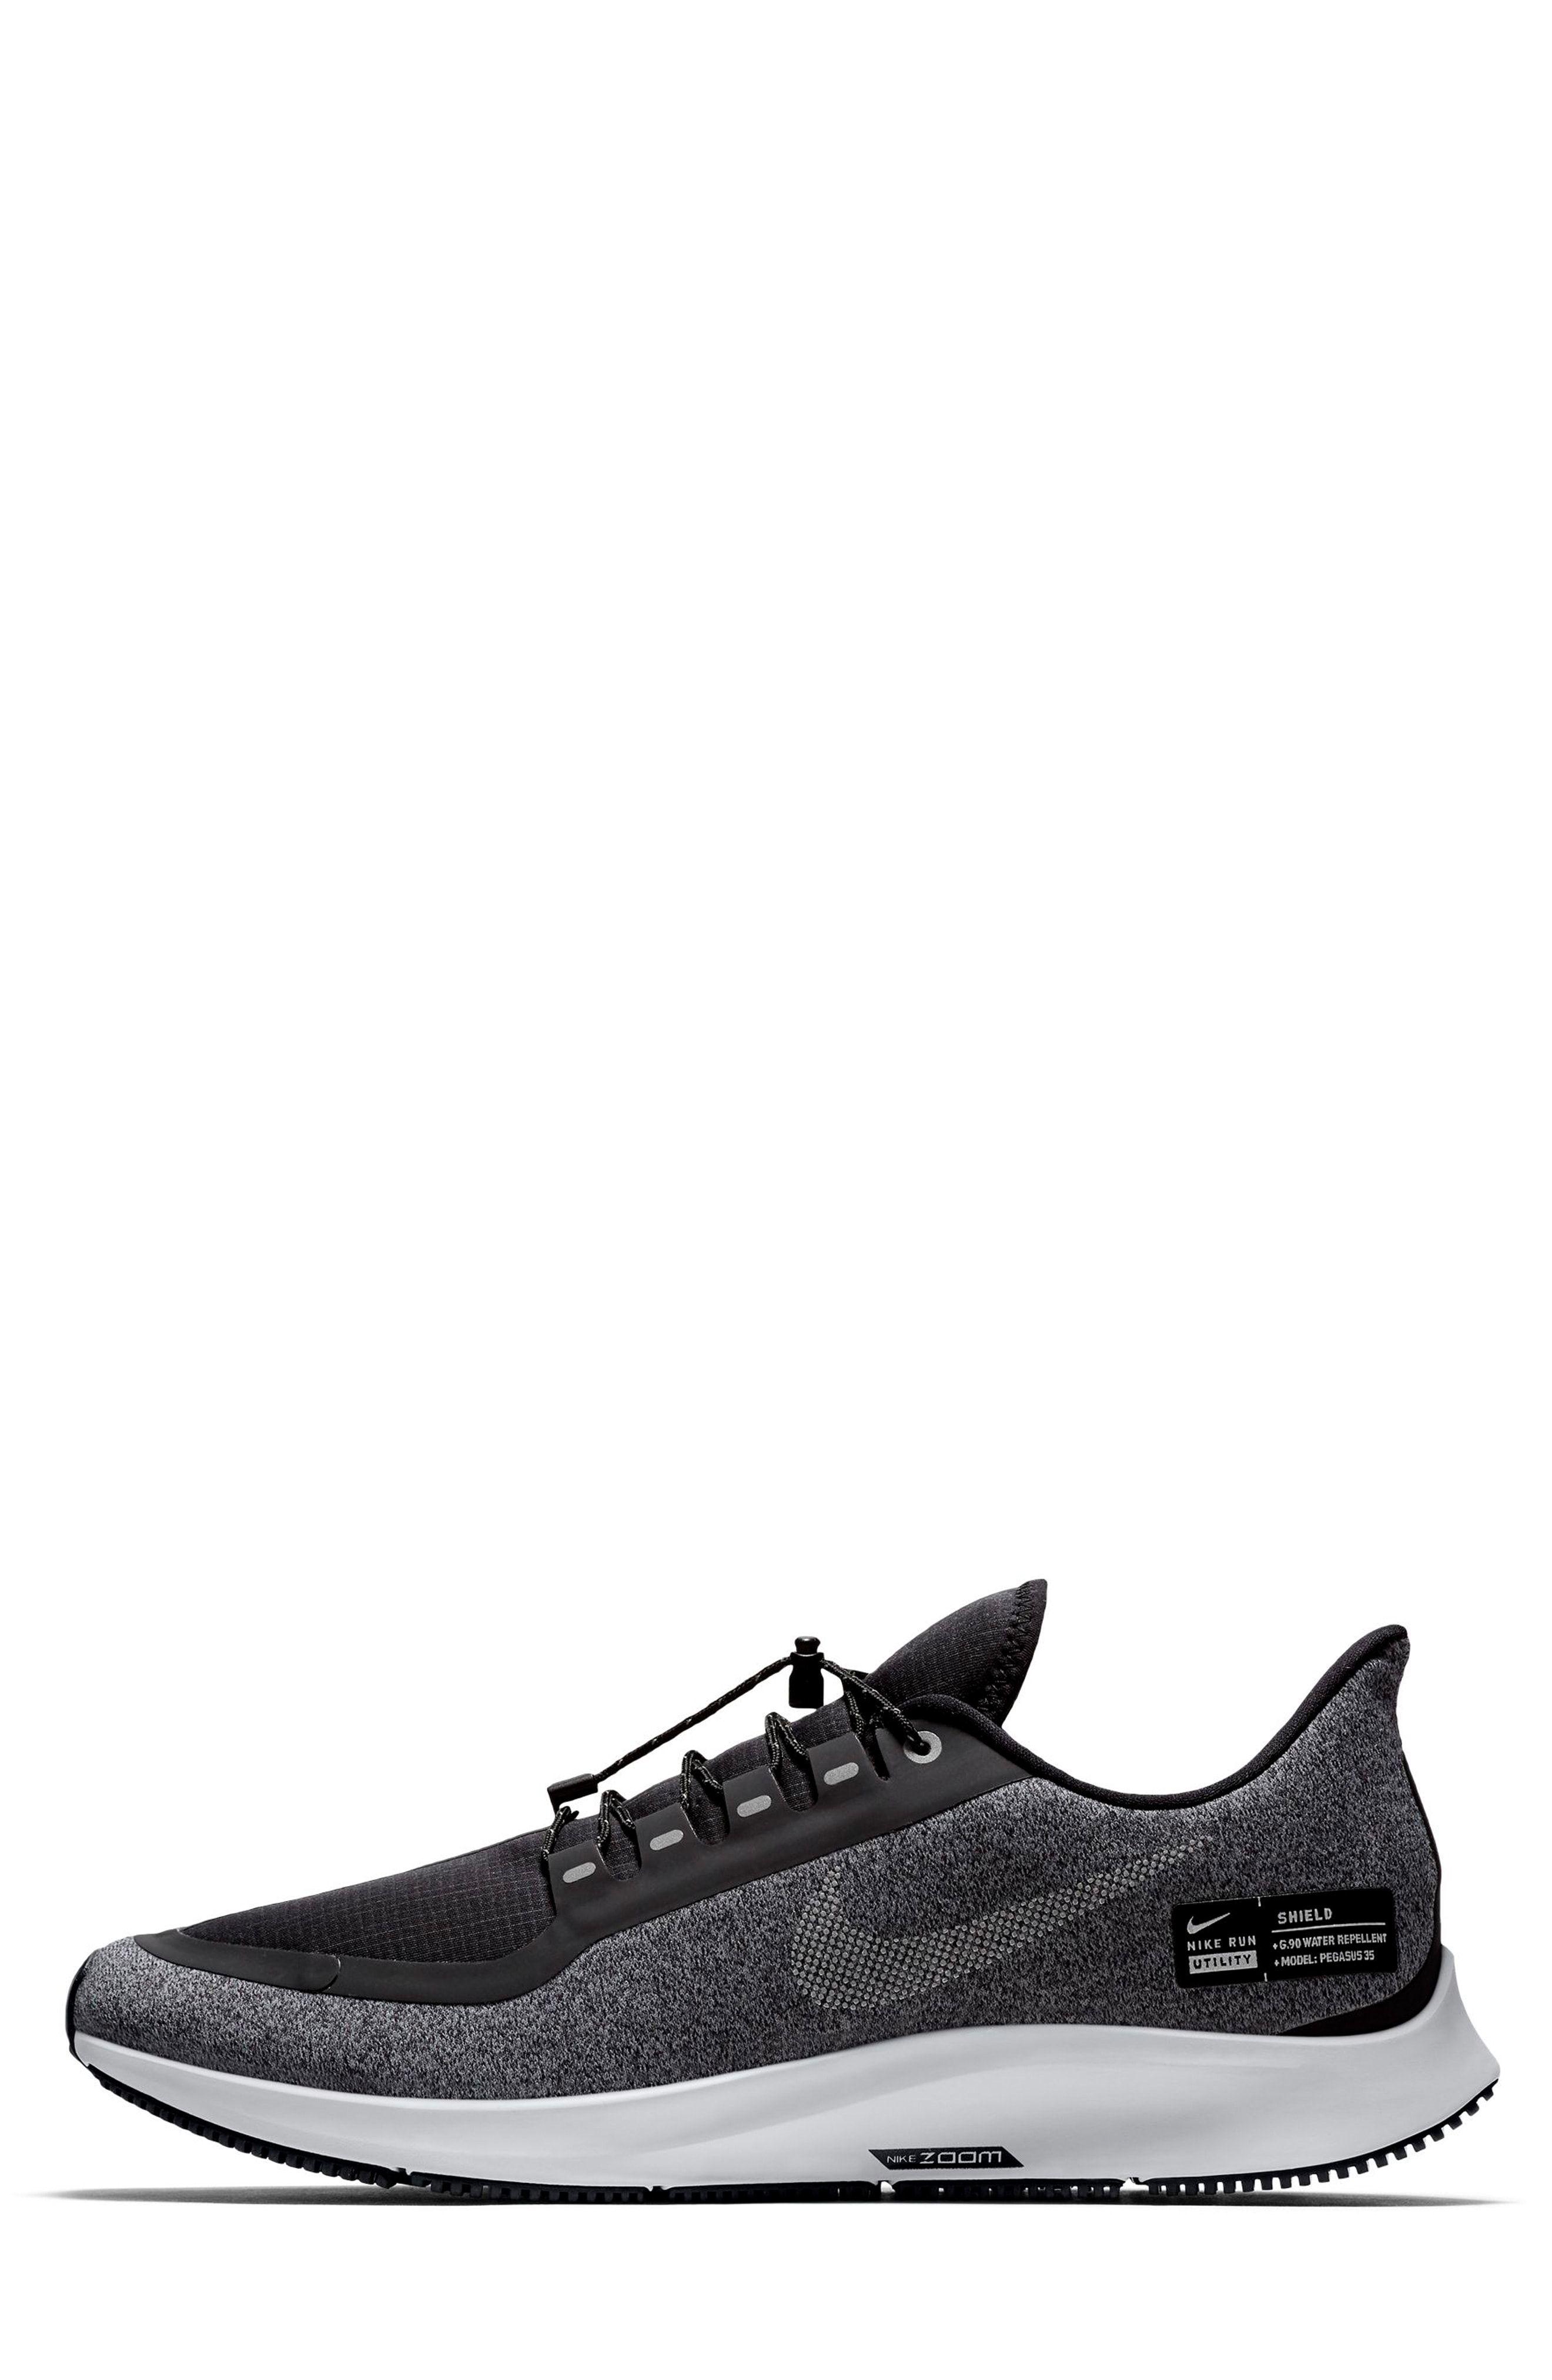 Nike Air Zoom Pegasus 35 Shield Water Repellent Running Shoe Men Running Shoes For Men Shoes All Black Sneakers